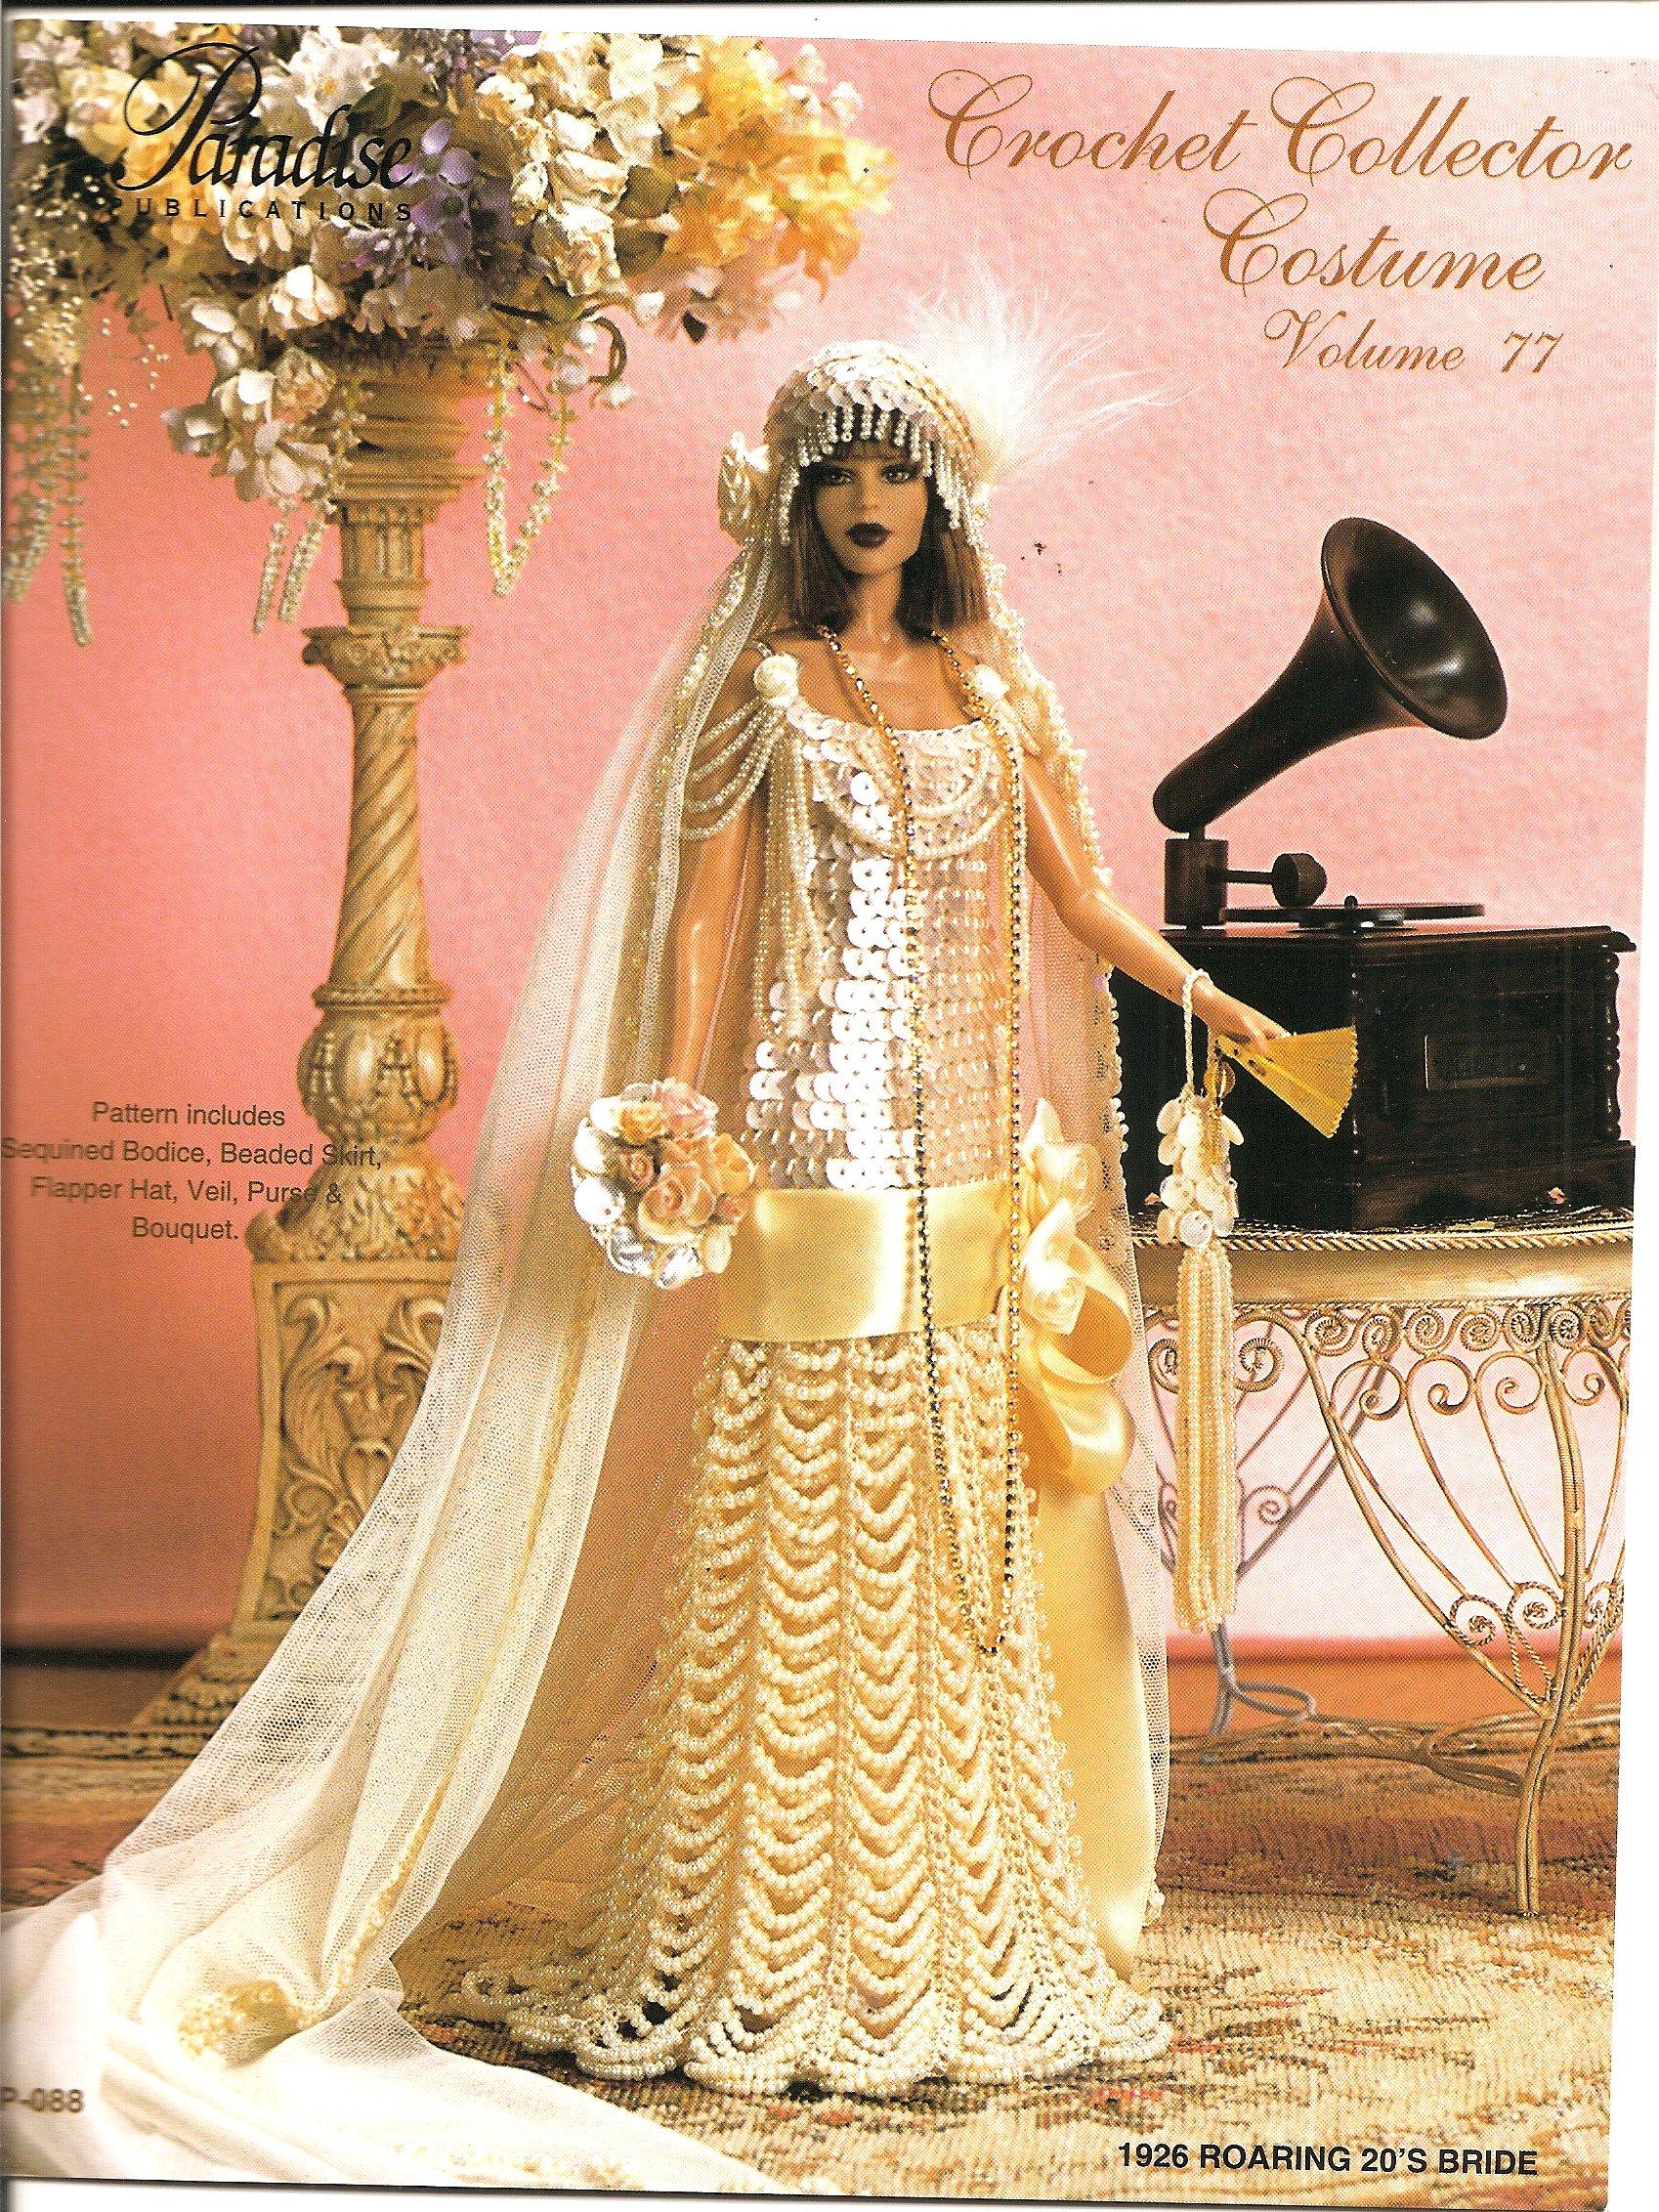 Crochet Collector Costume, Vol. 77 ''1926 Roaring 20's Bride''